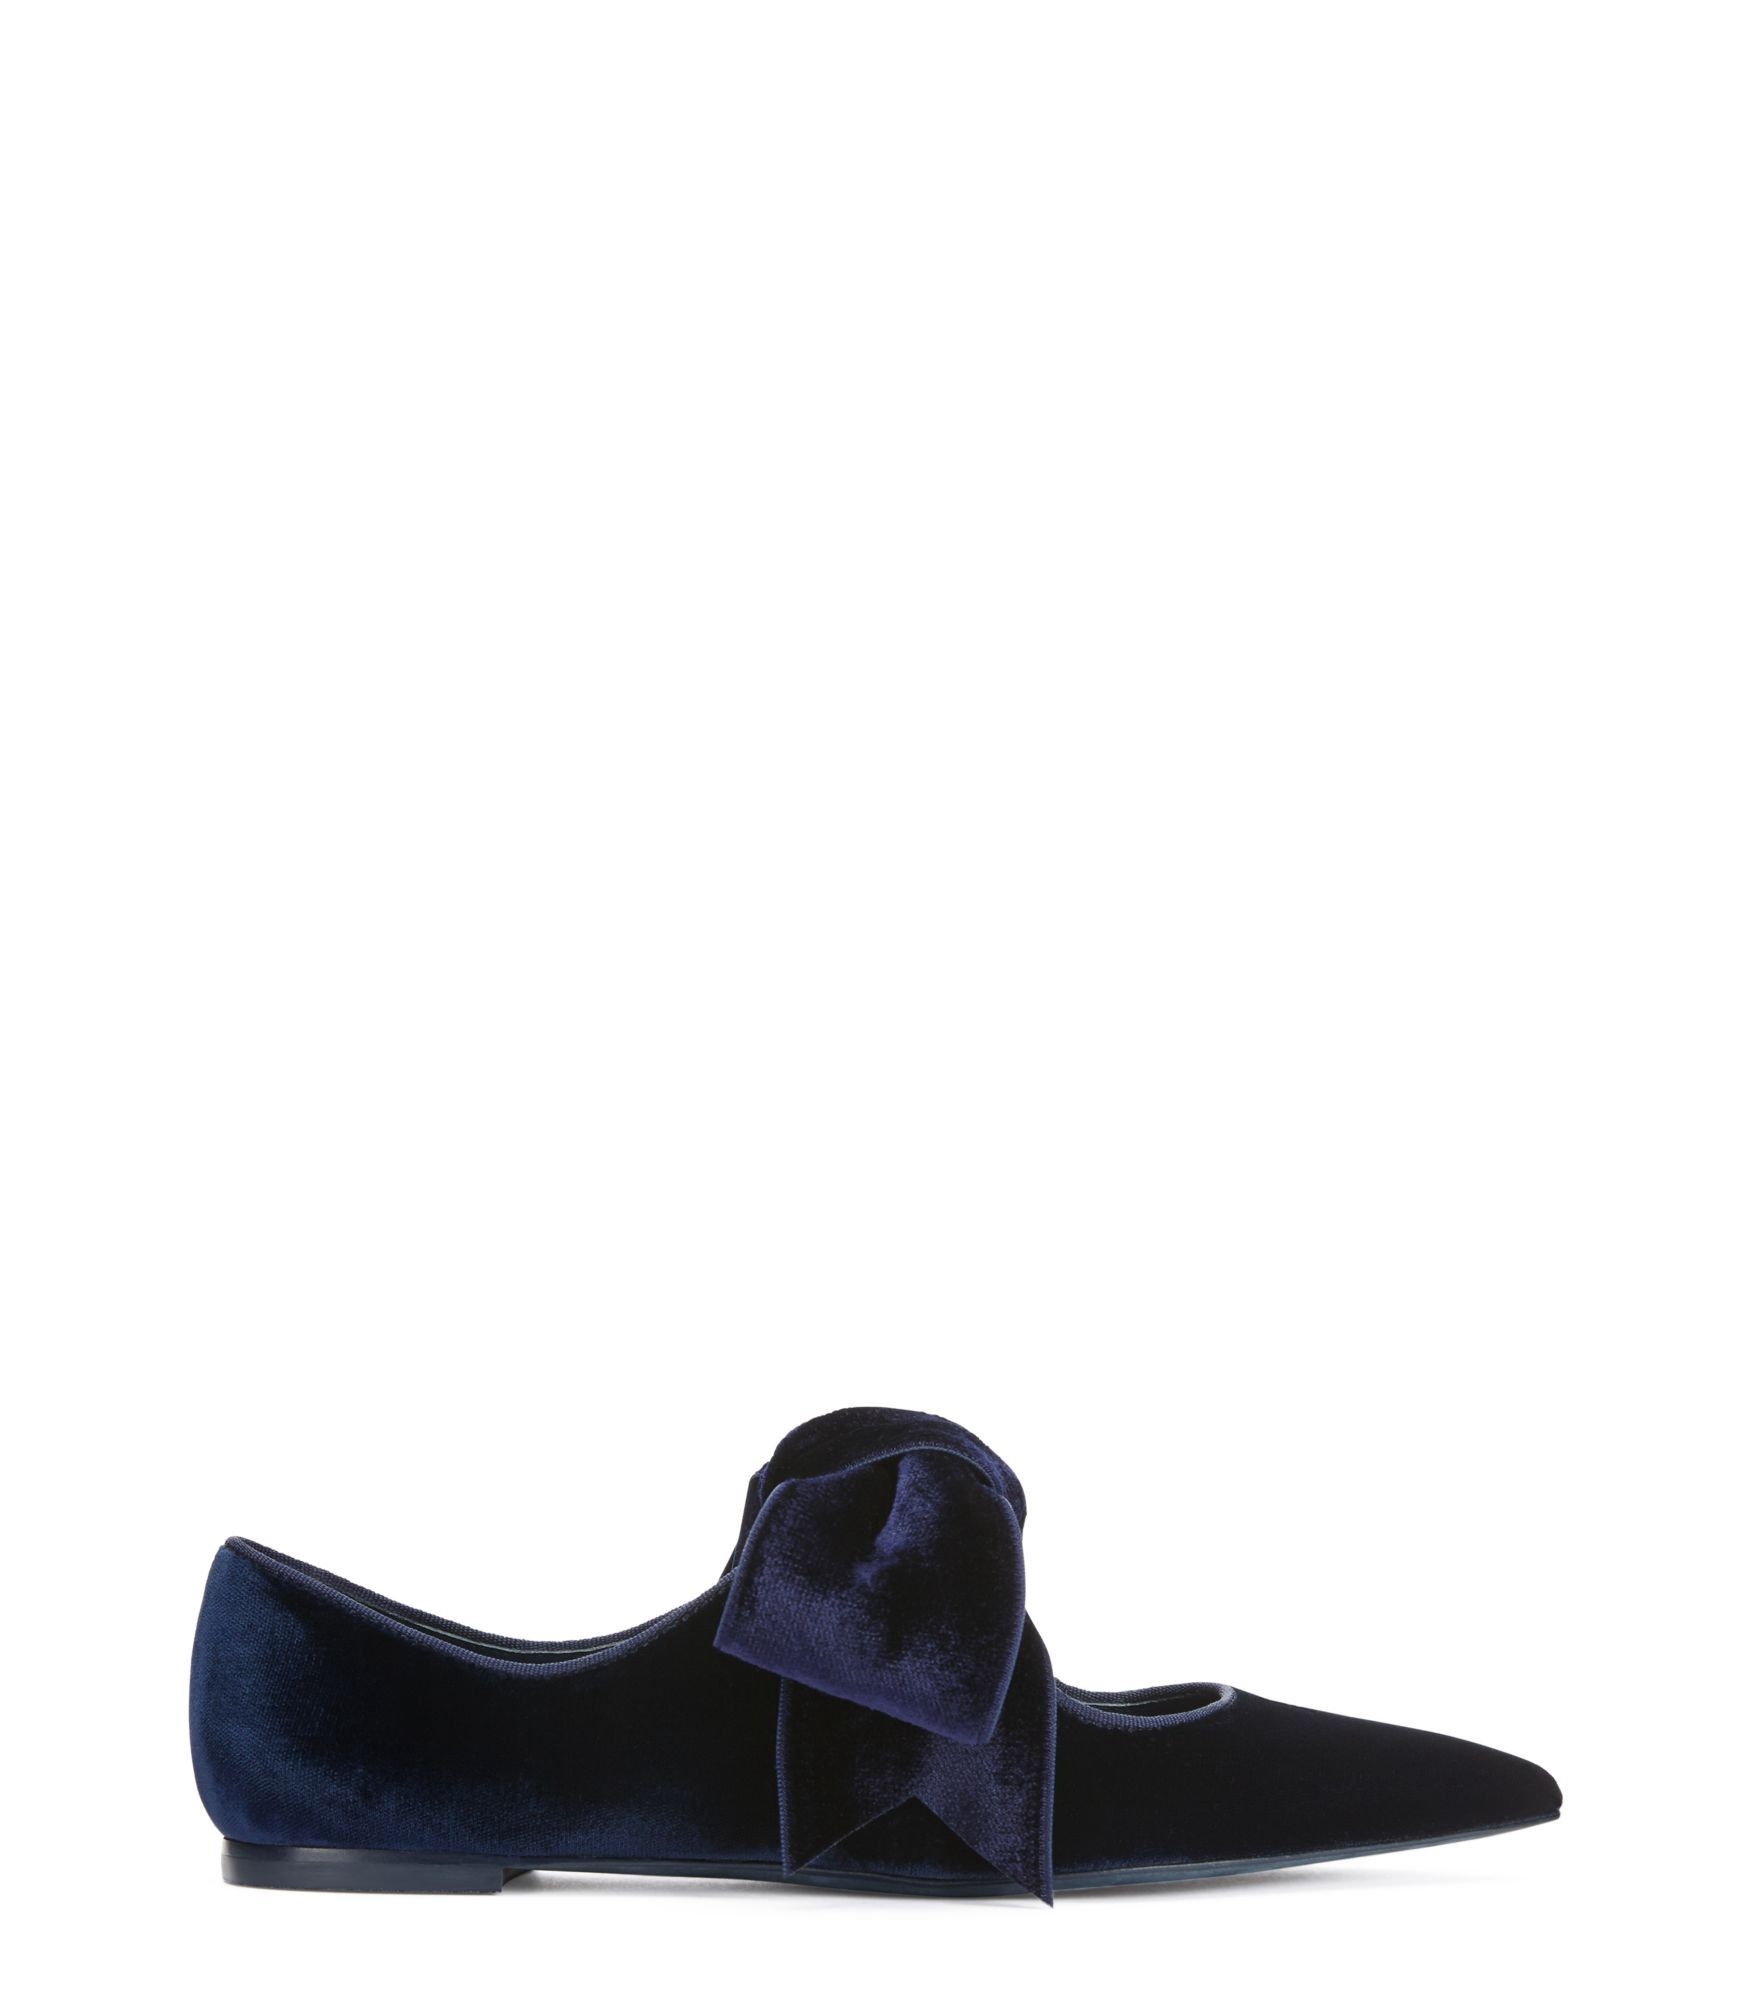 964d28dbf TORY BURCH CLARA FLAT. #toryburch #shoes # | Tory Burch | Tory burch ...